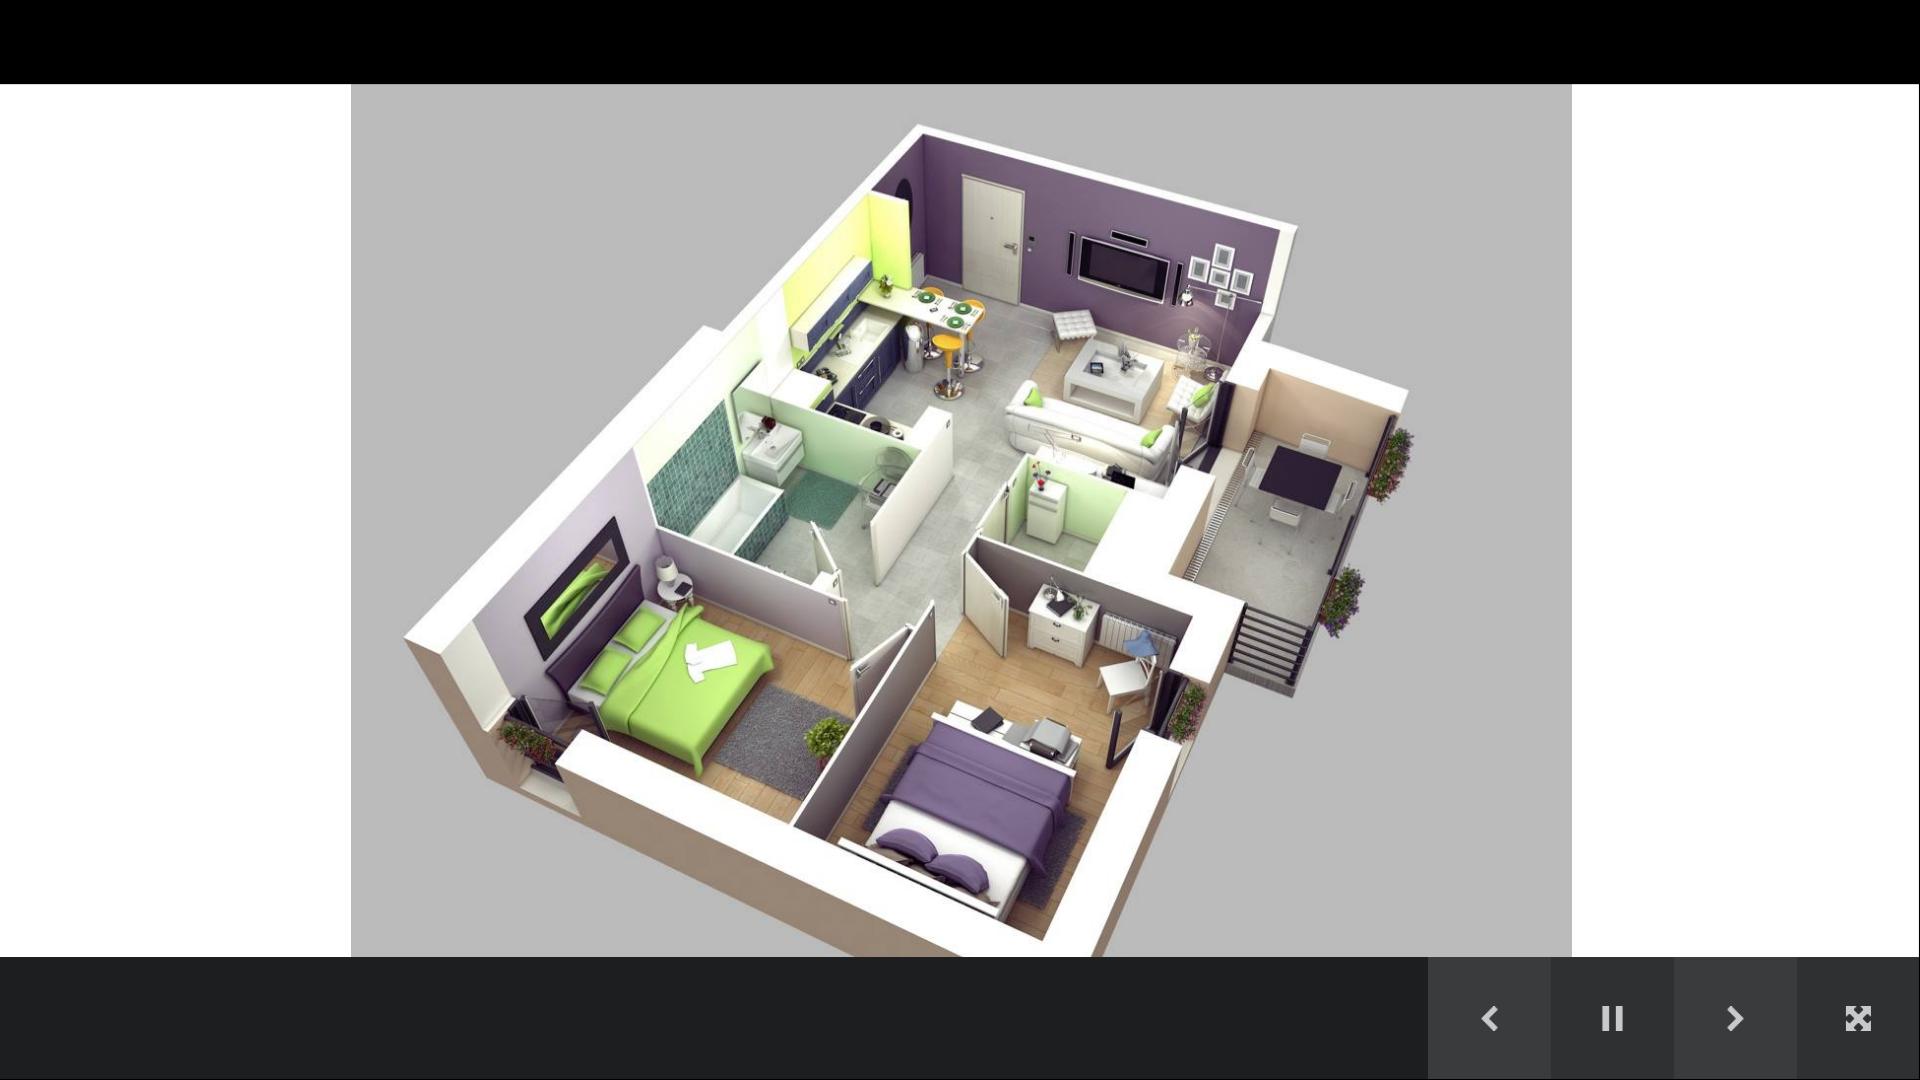 Hauspläne 3d  3D-Haus-Pläne - Revenue & Download estimates - Google Play Store ...